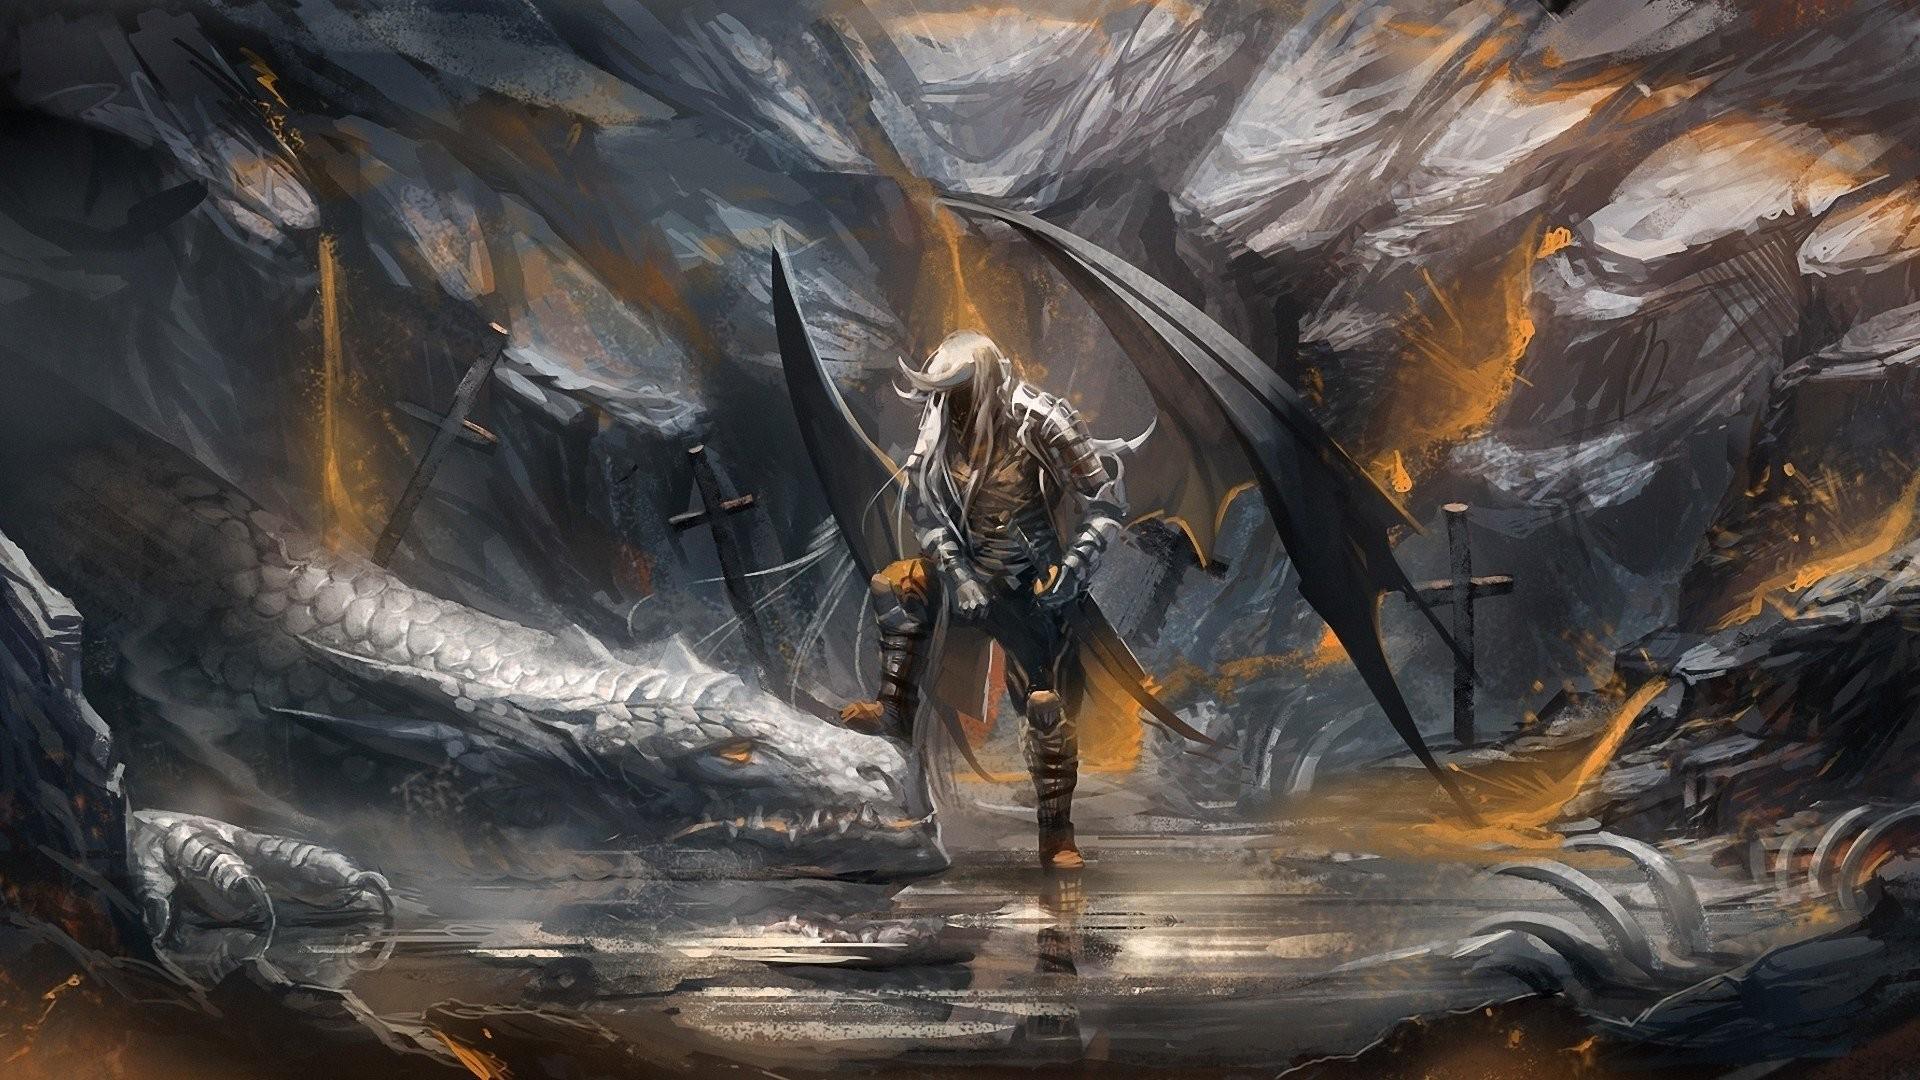 Dragon Slayer Wallpaper 74 Images